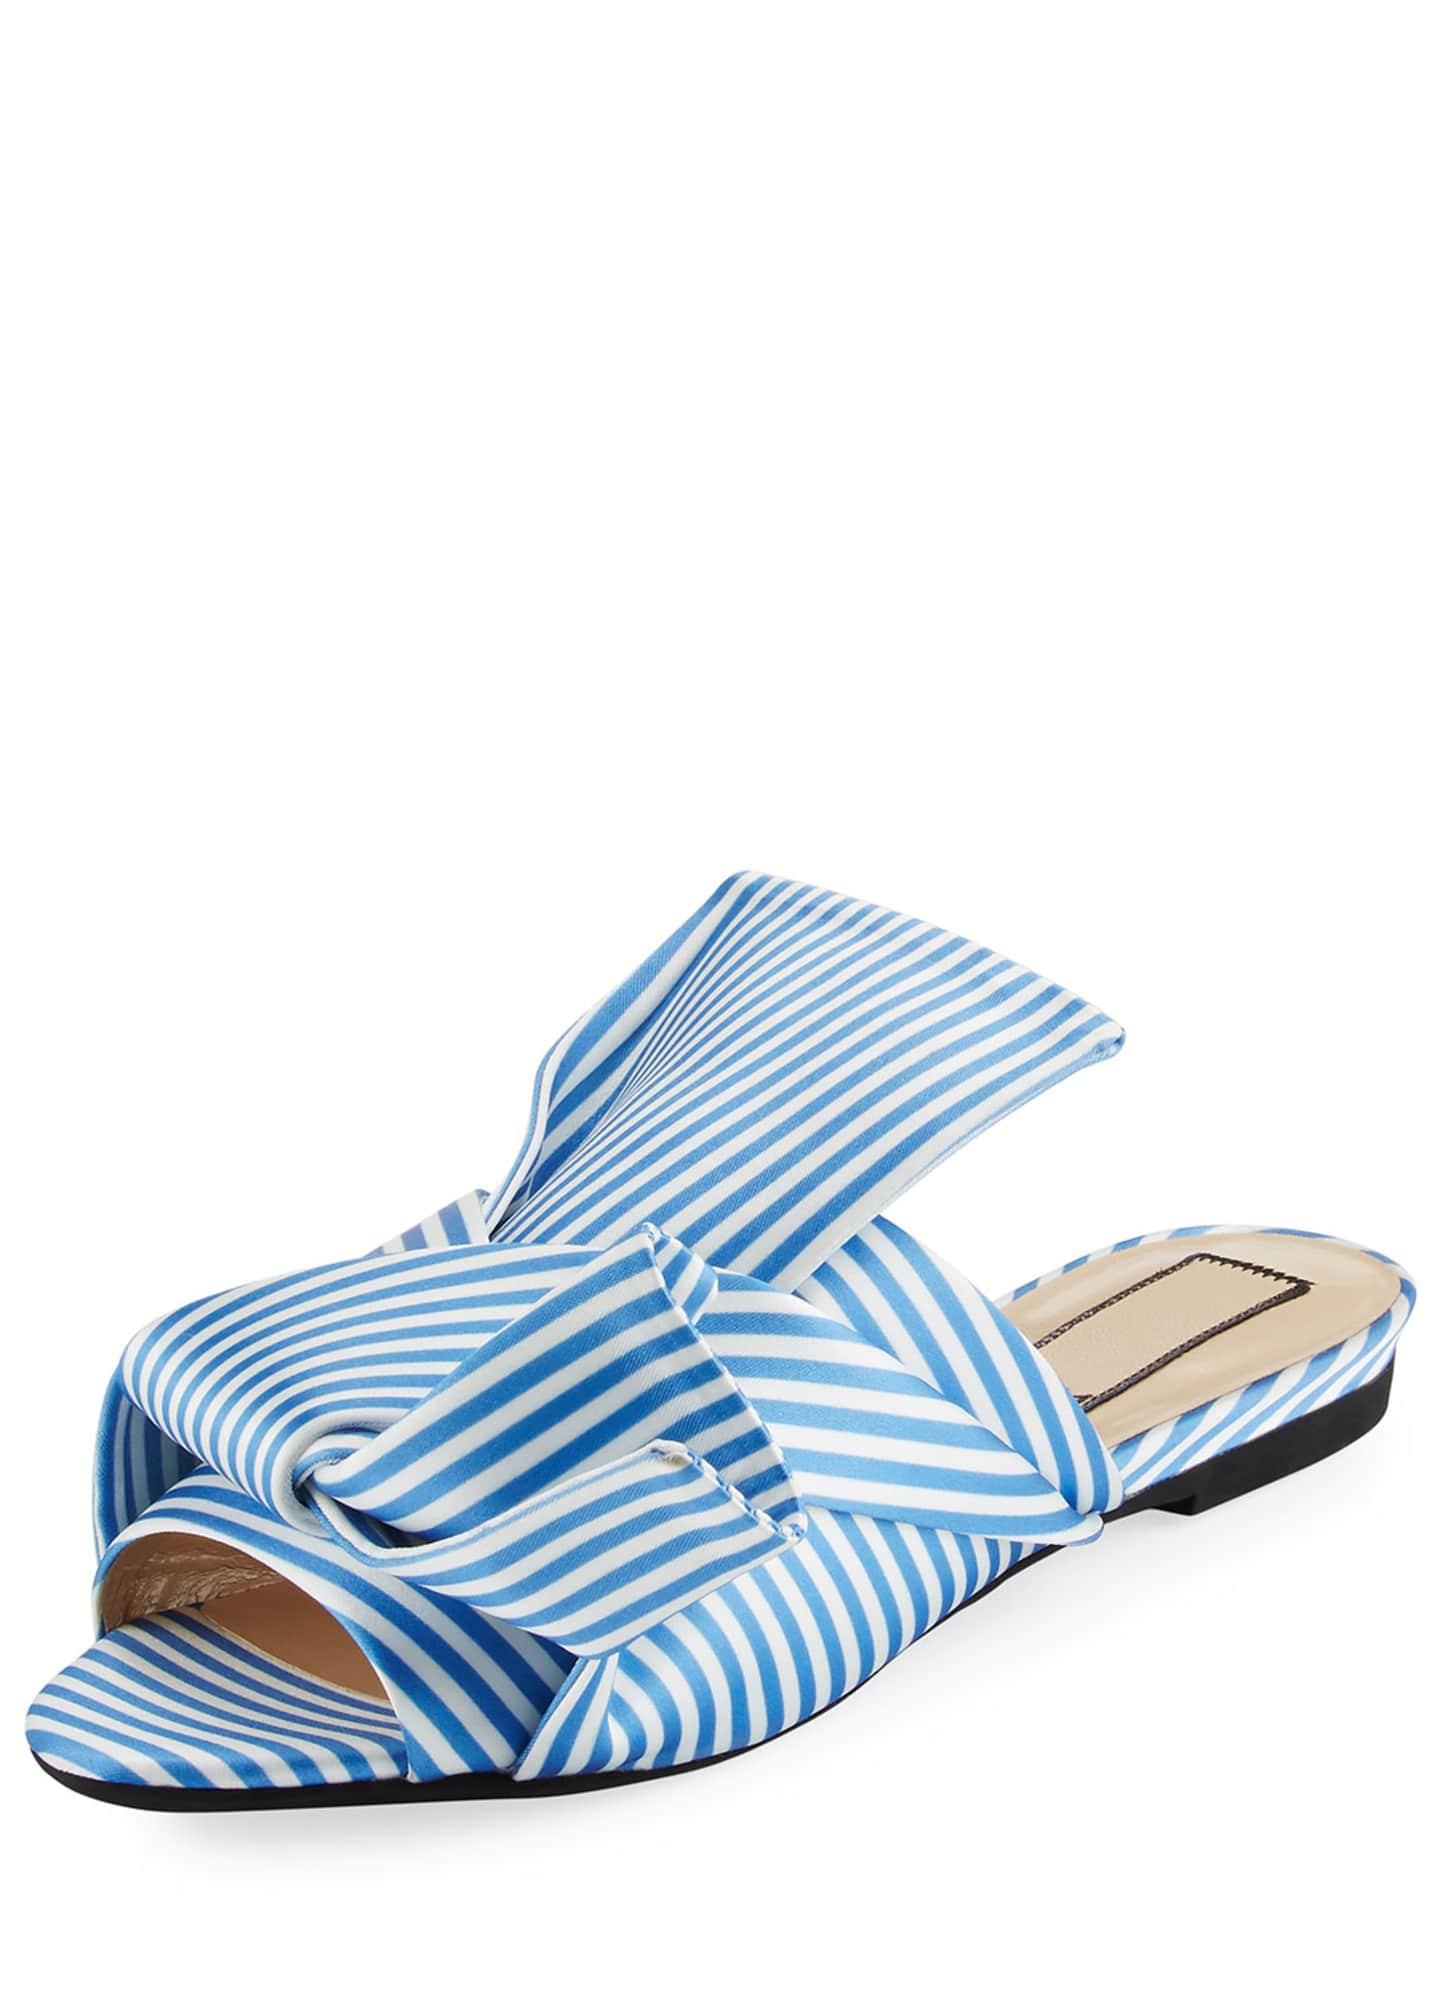 No. 21 Striped Seersucker Satin Slide Sandal, White/Blue